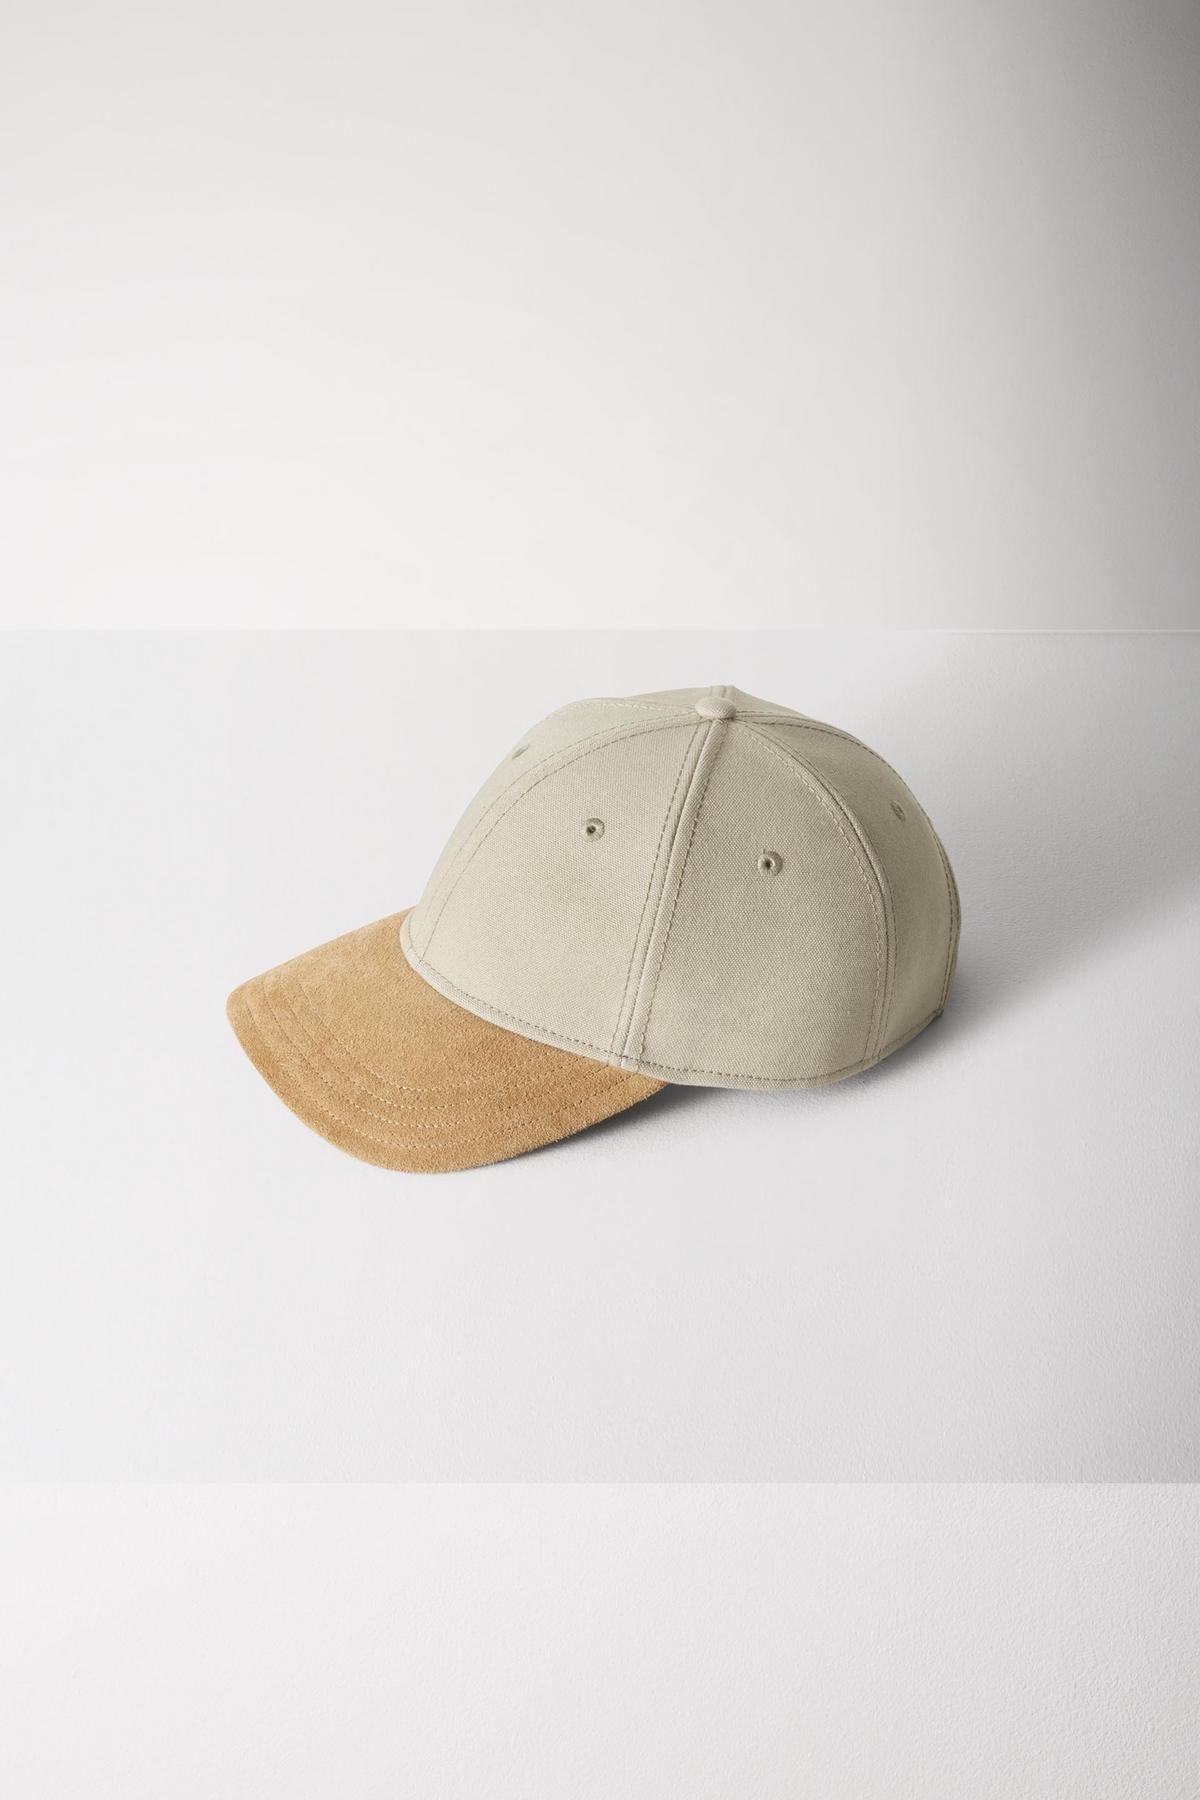 Shop The Suede Brim Baseball Cap On Rag Bone Brim Mens Accessories Baseball Cap